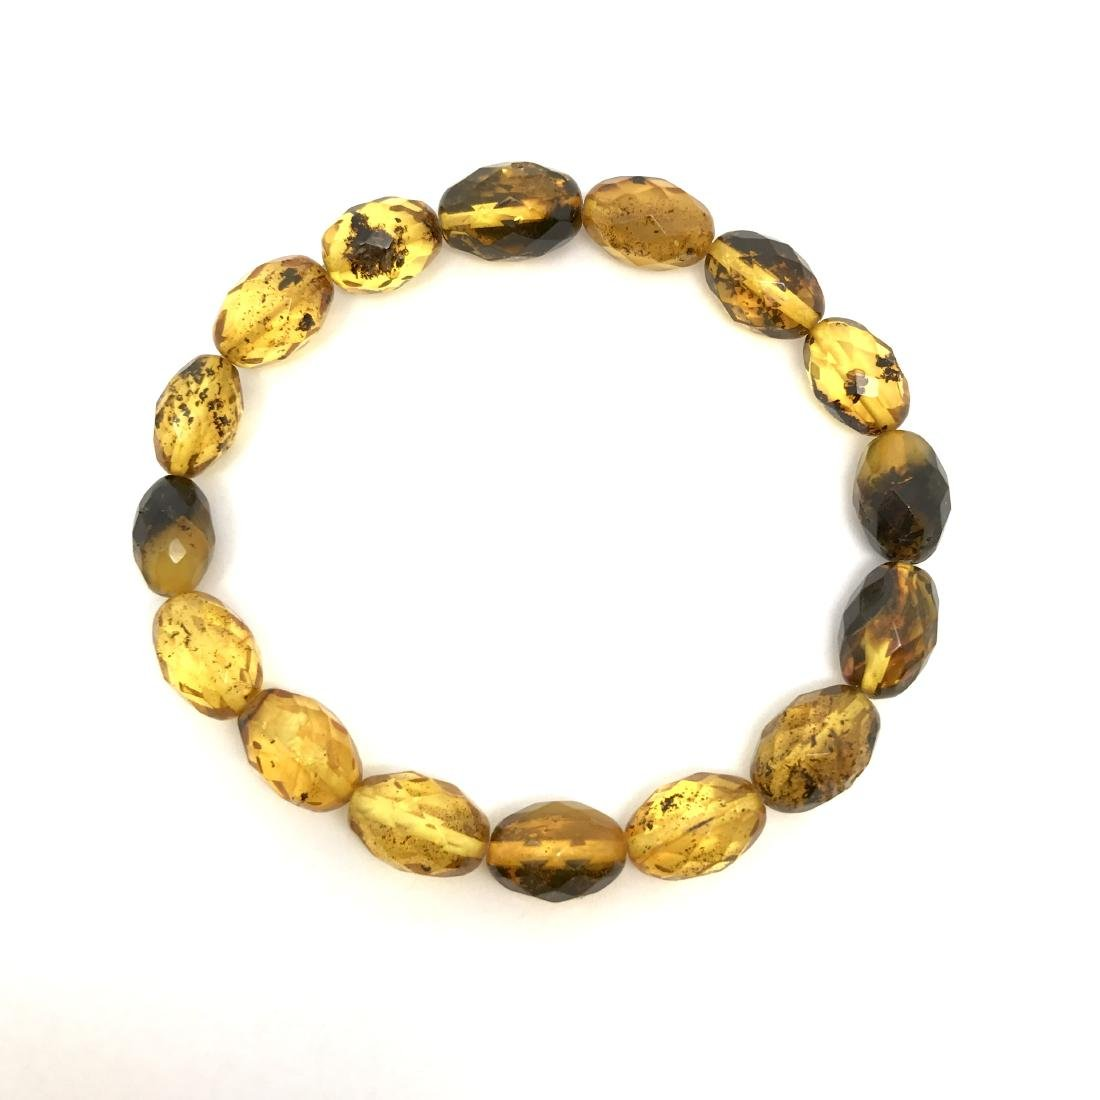 Unique bracelet faceted Baltic amber beads olives honey - 3